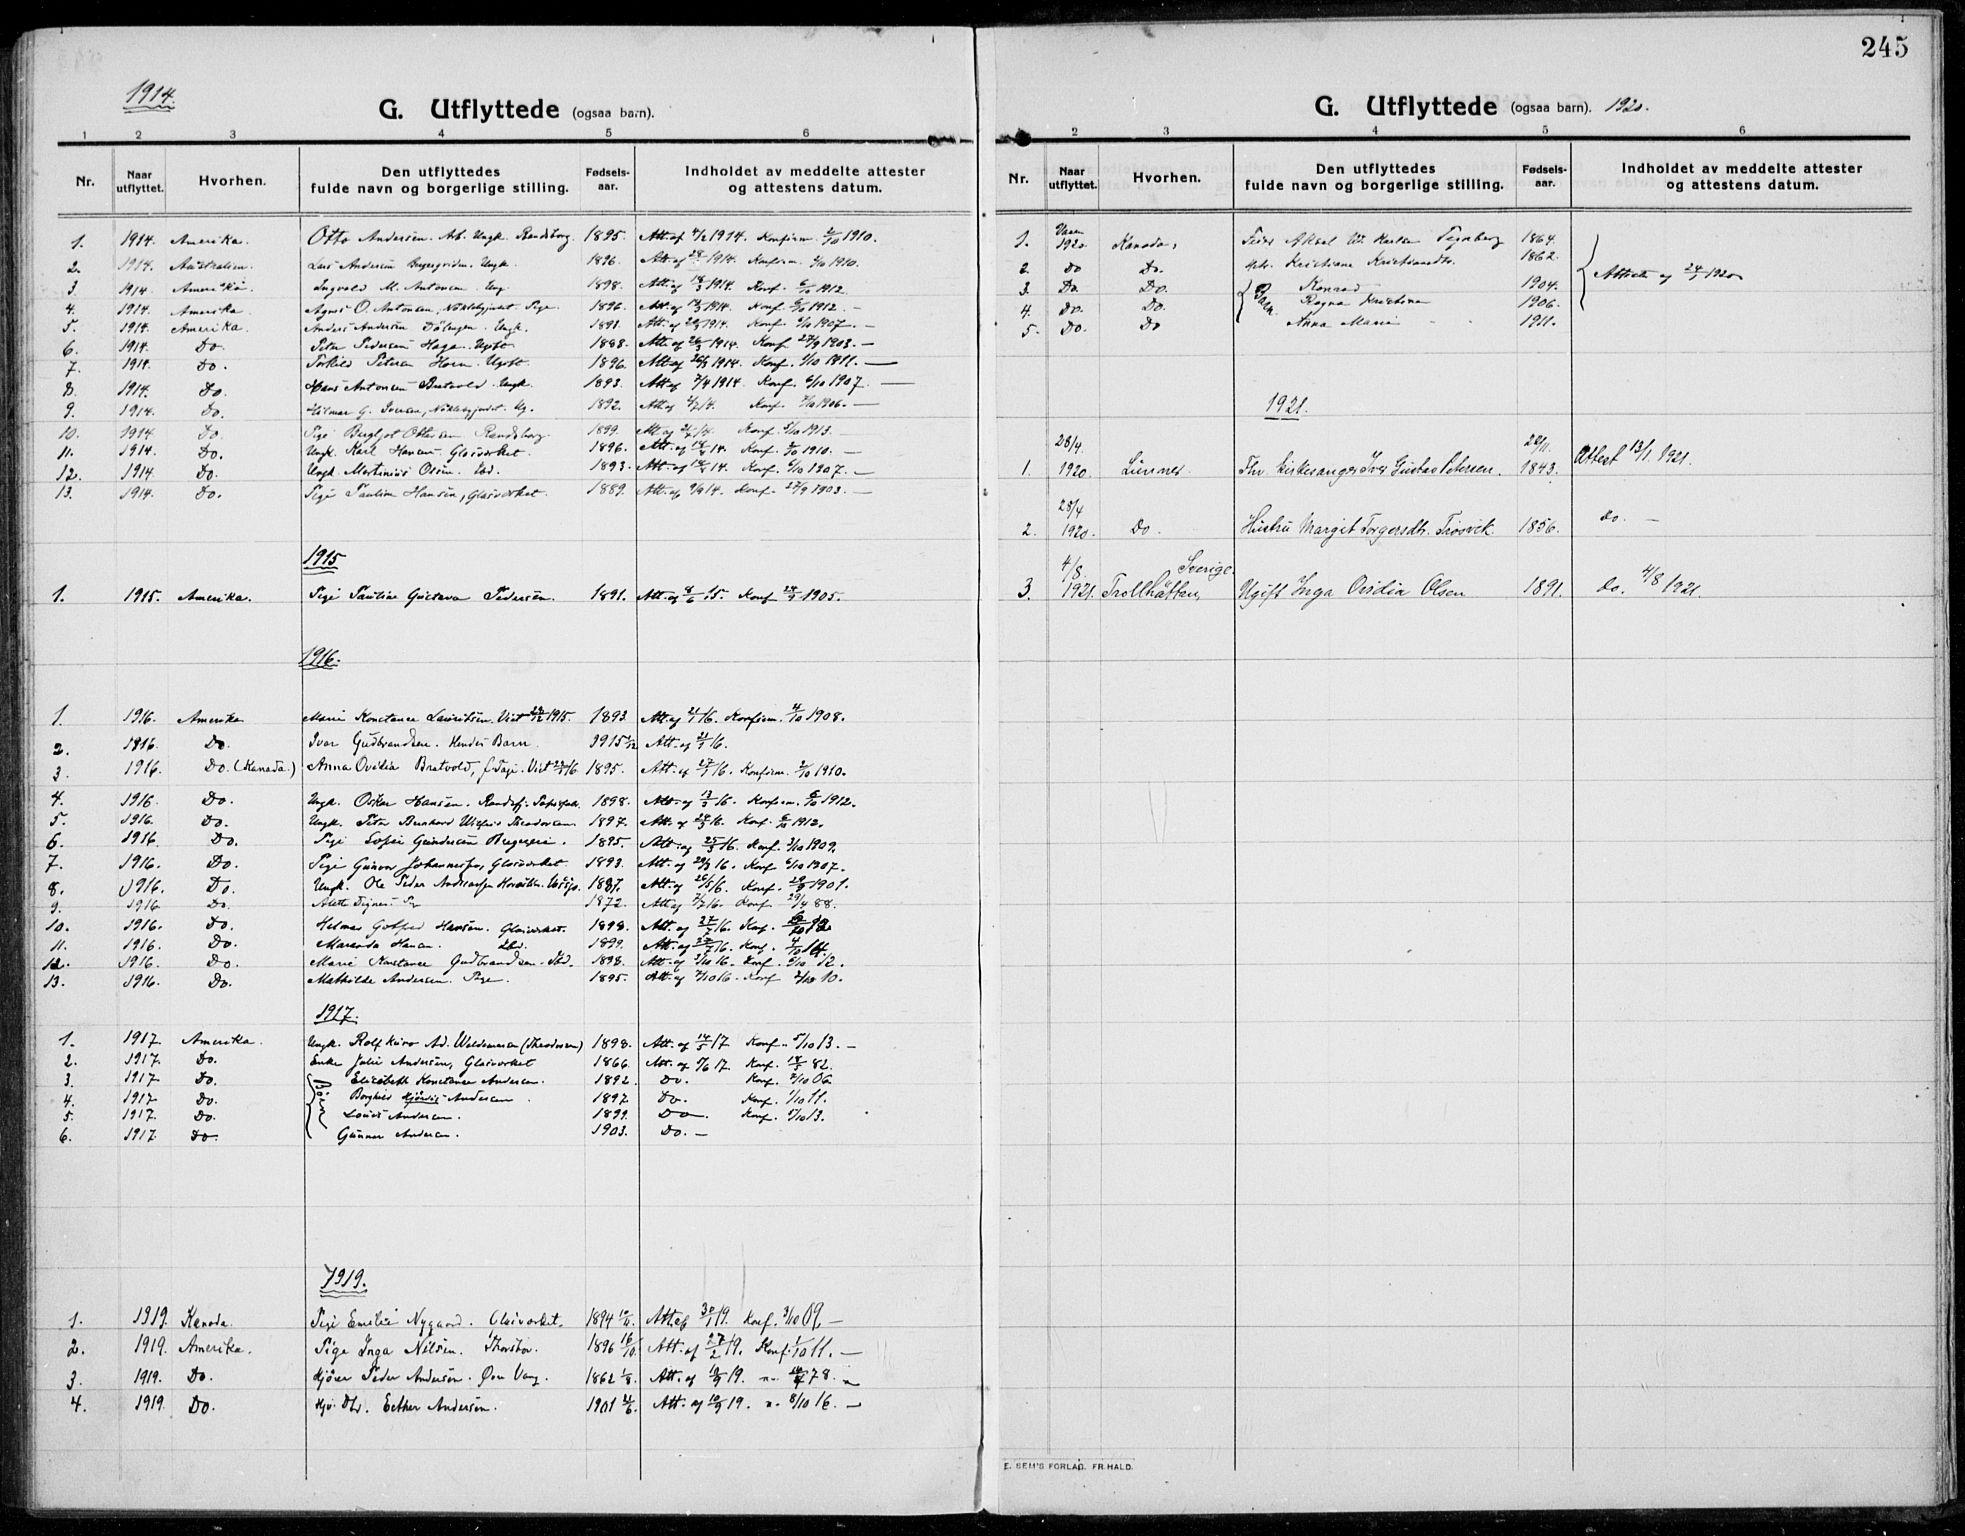 SAH, Jevnaker prestekontor, Ministerialbok nr. 12, 1914-1924, s. 245